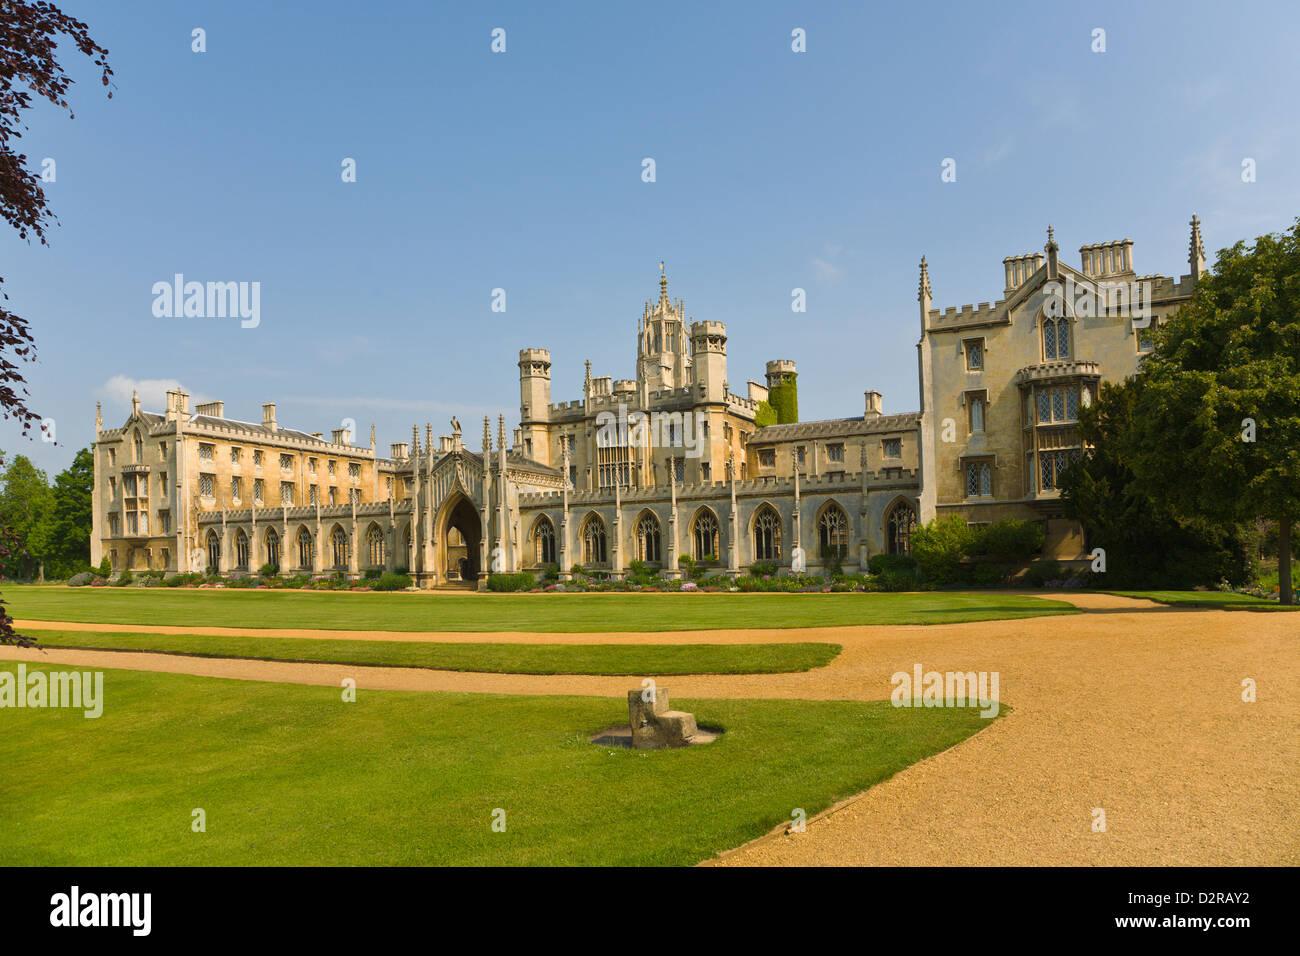 St Johns College Cambridge England - Stock Image